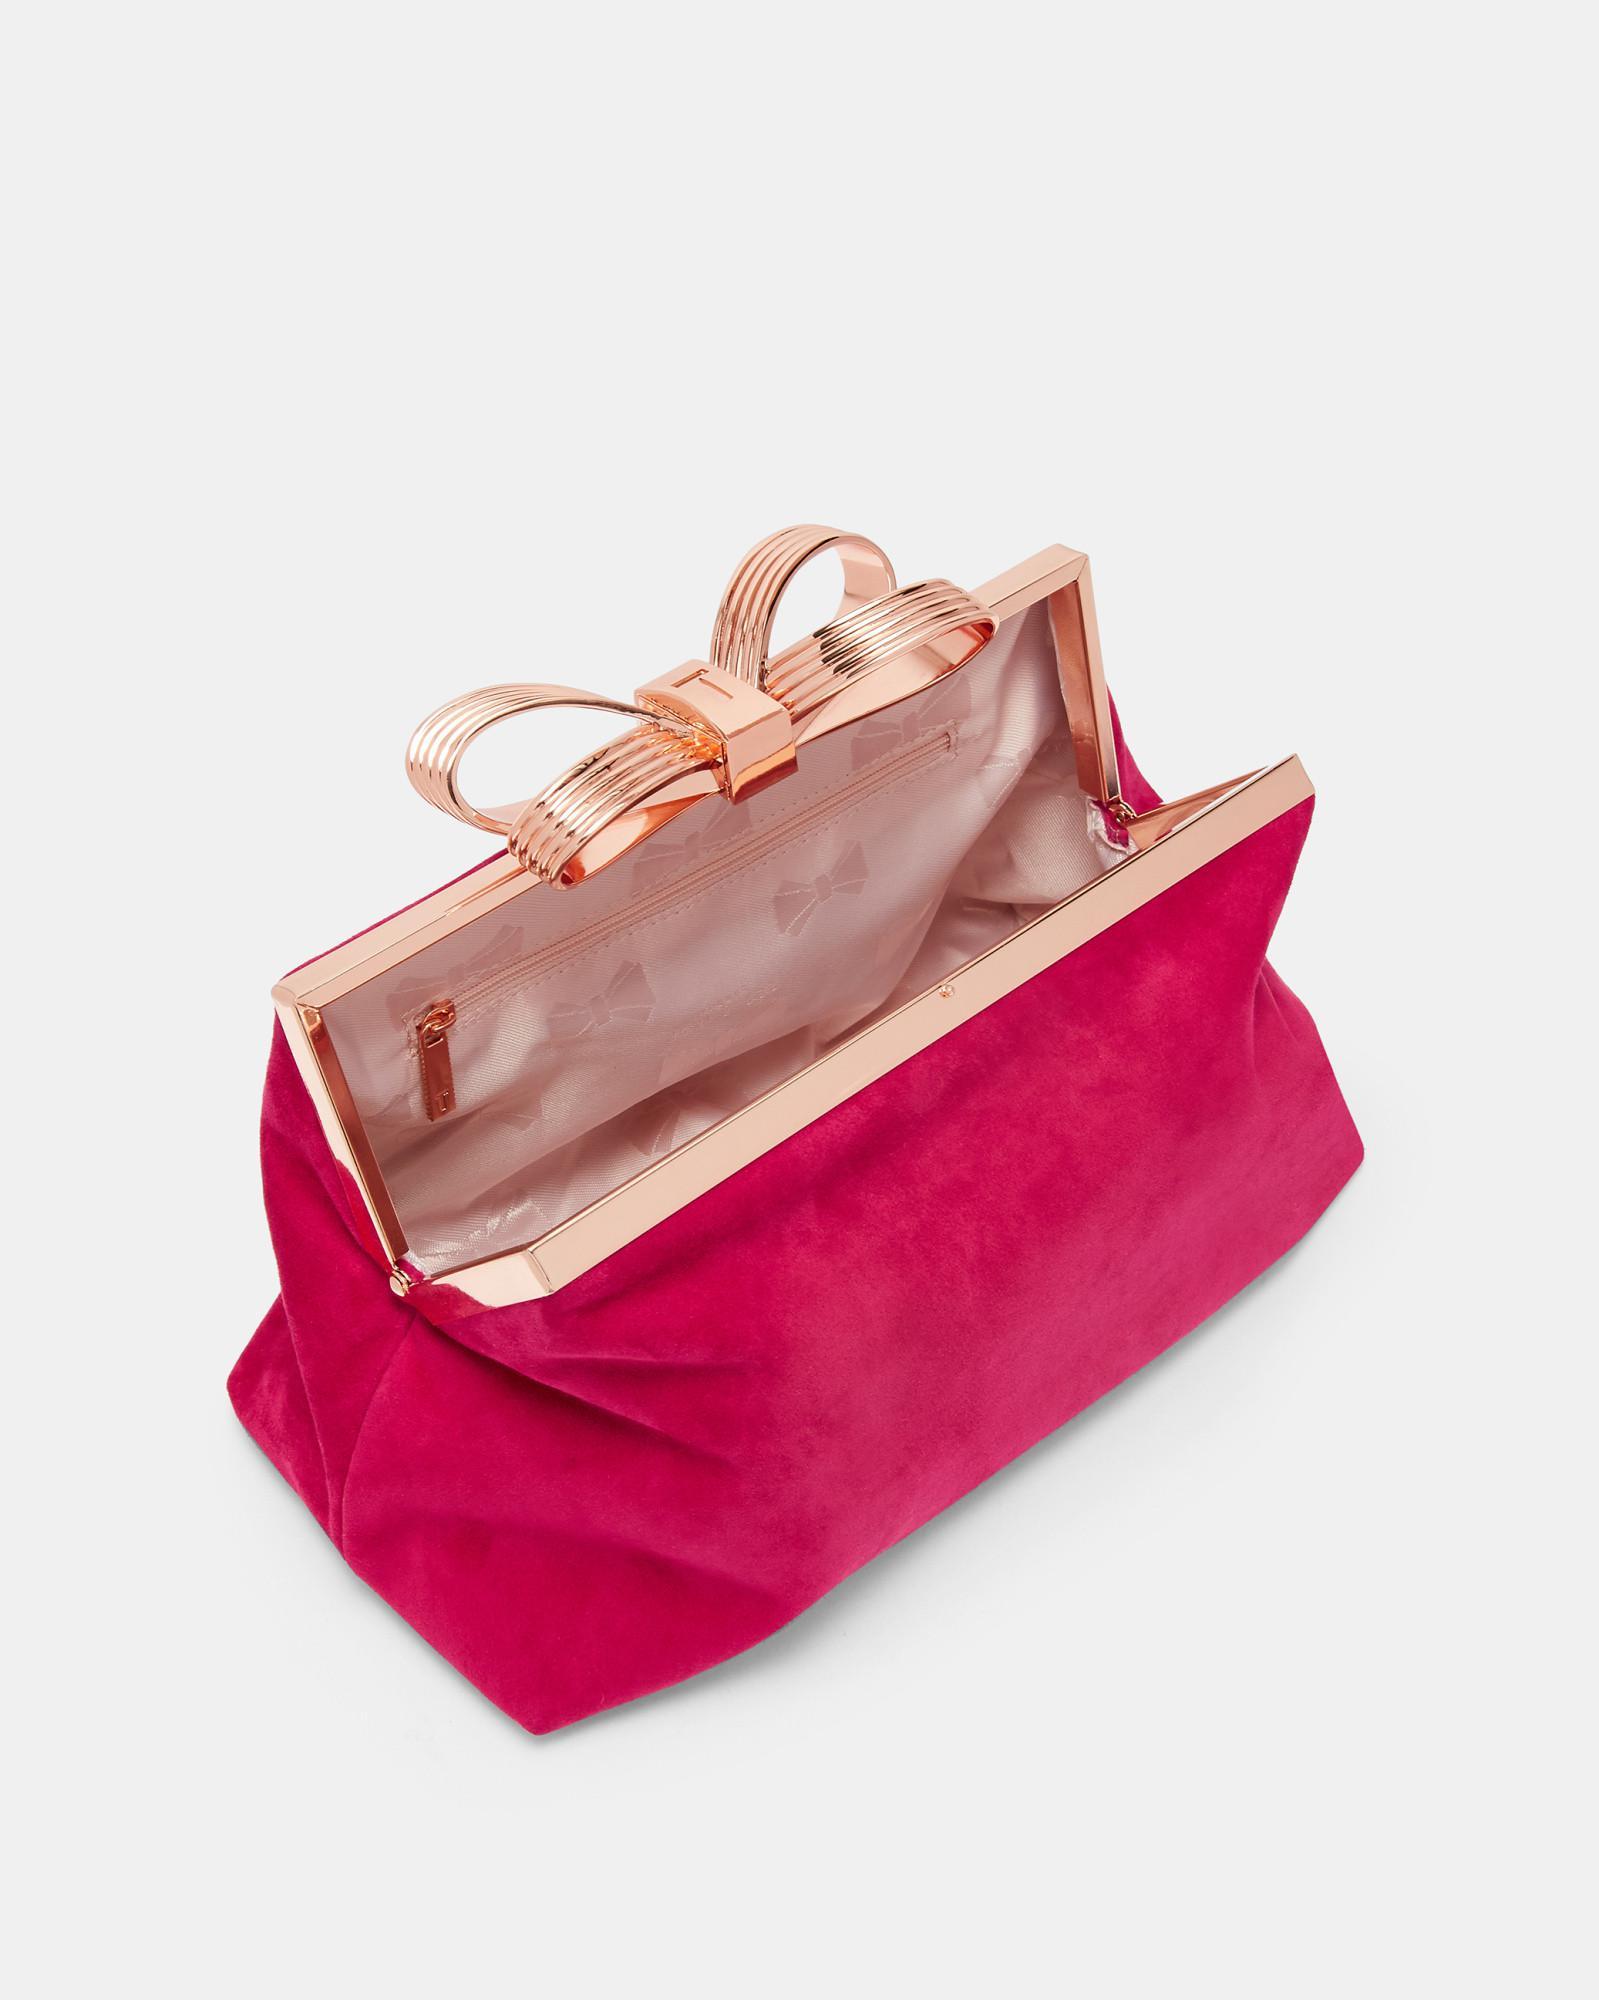 VIDA Leather Statement Clutch - Psyché Bag by VIDA Wkag23